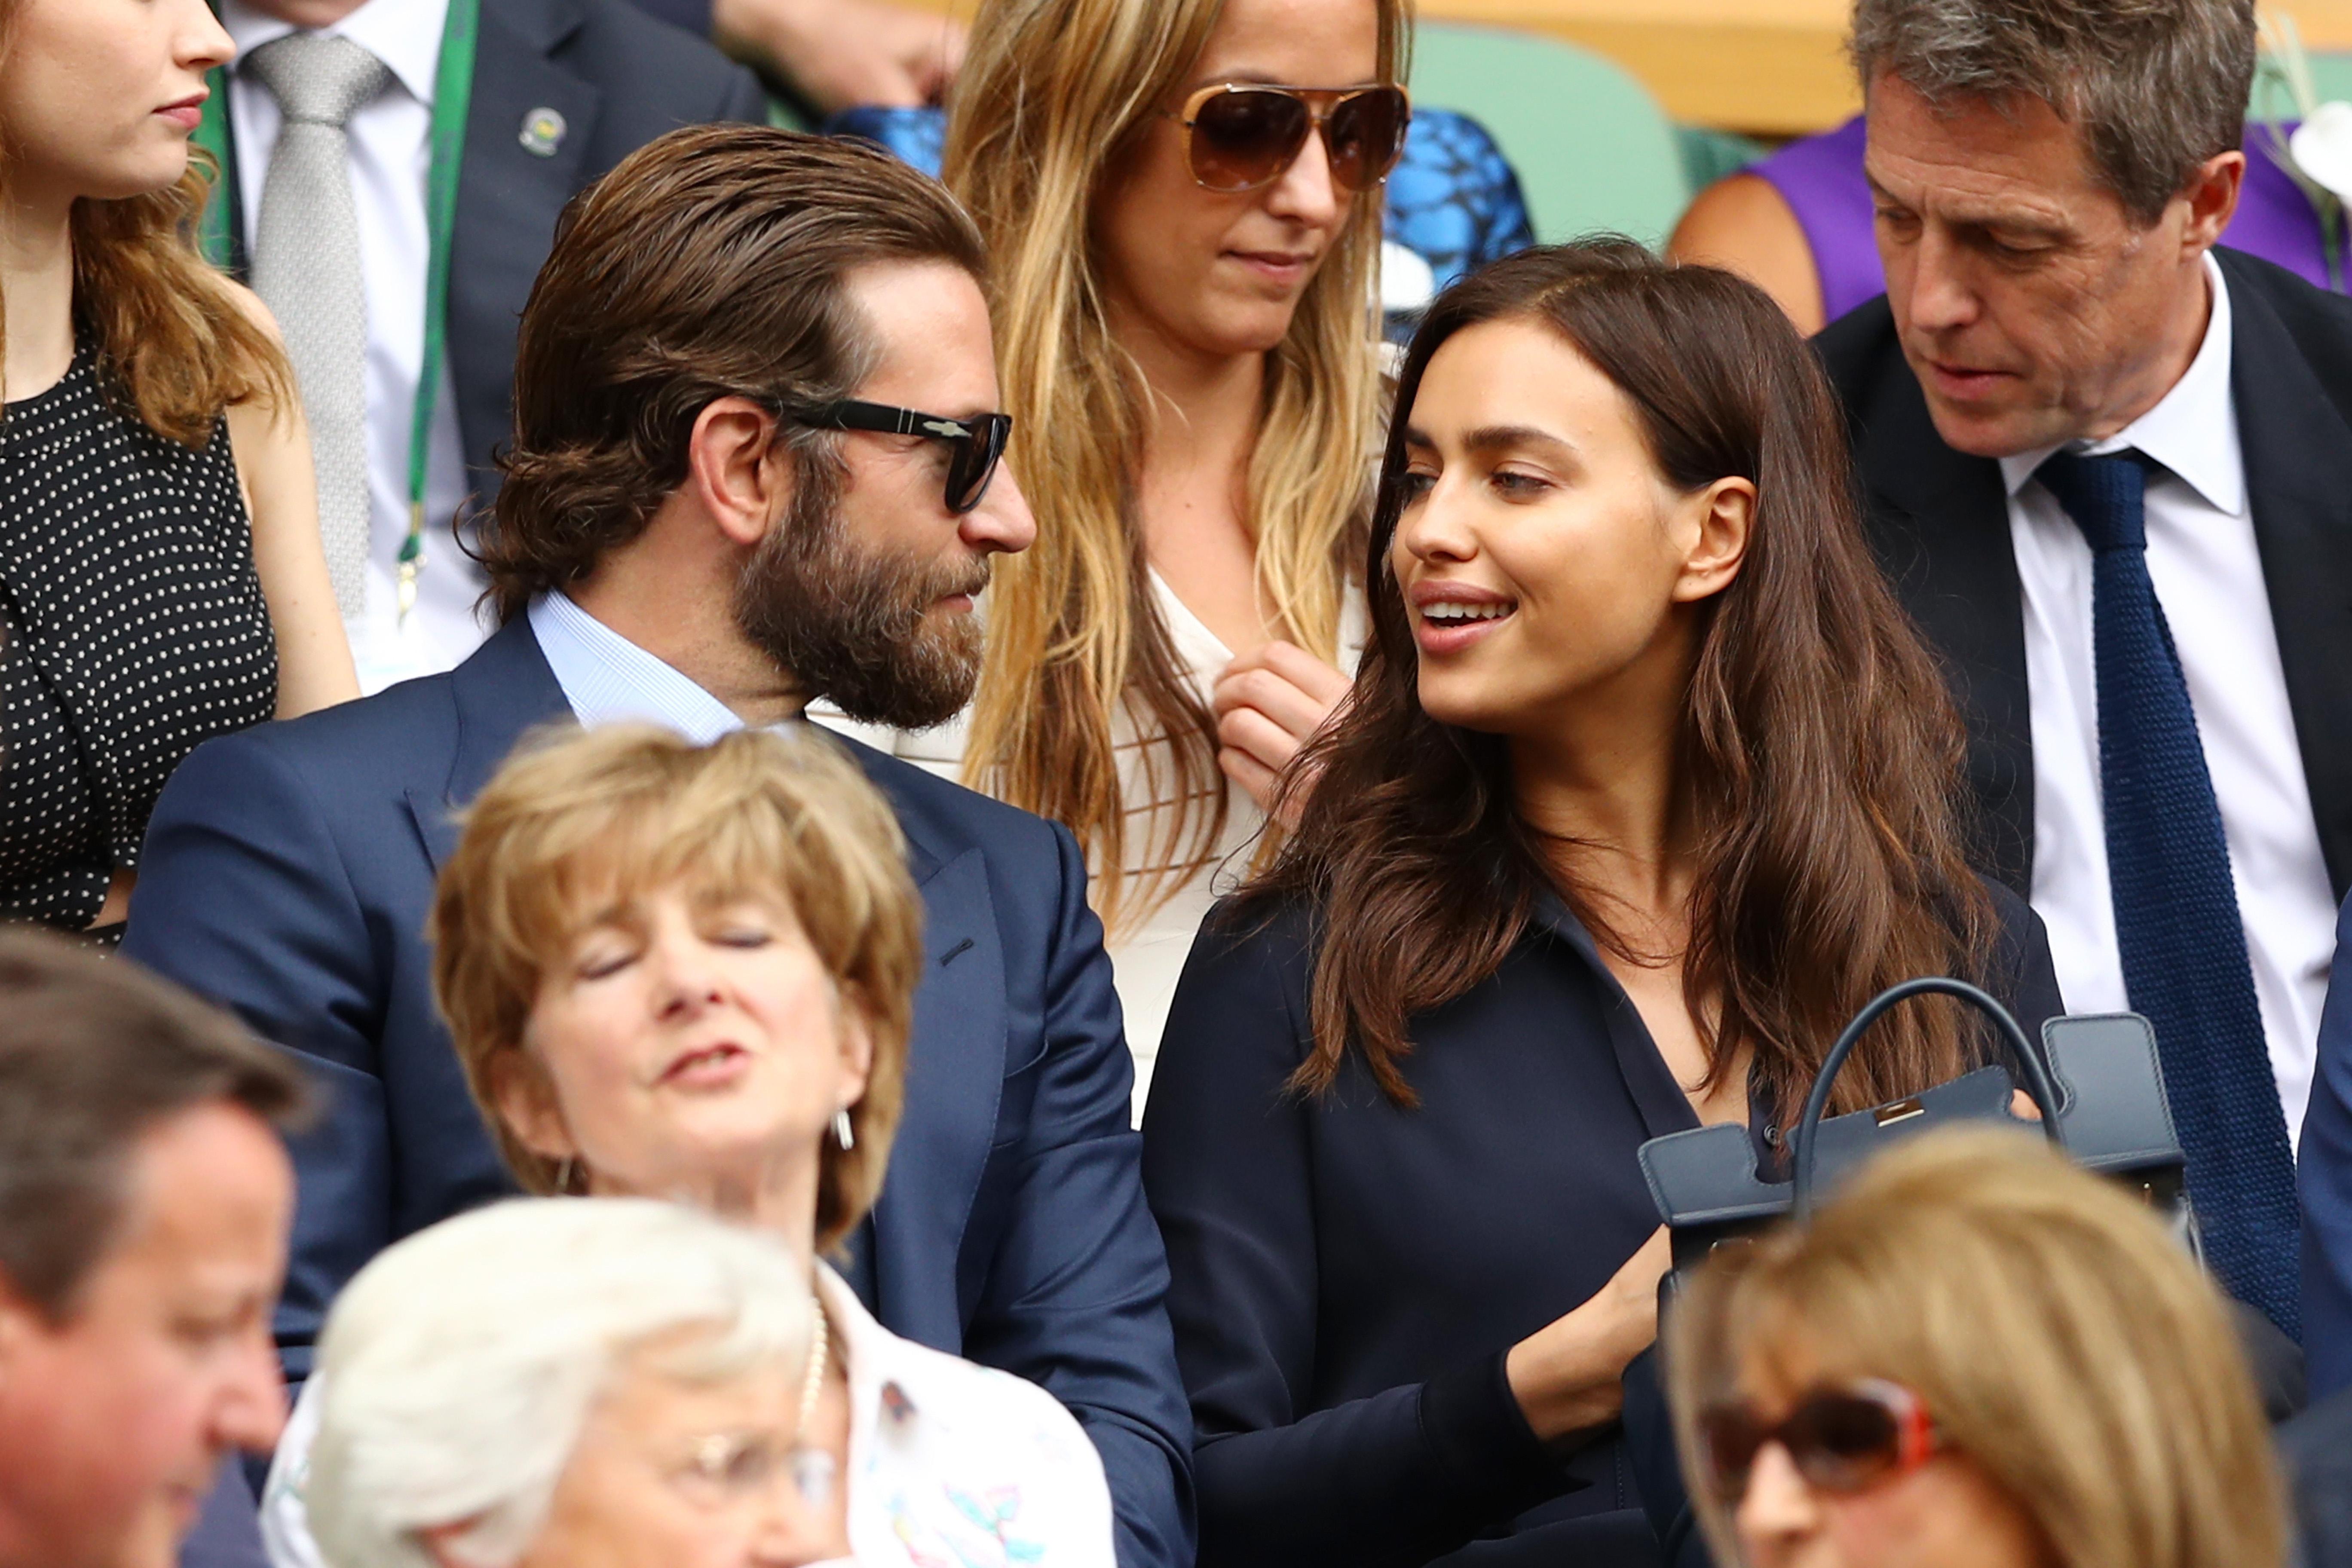 Day Thirteen: The Championships - Wimbledon 2016